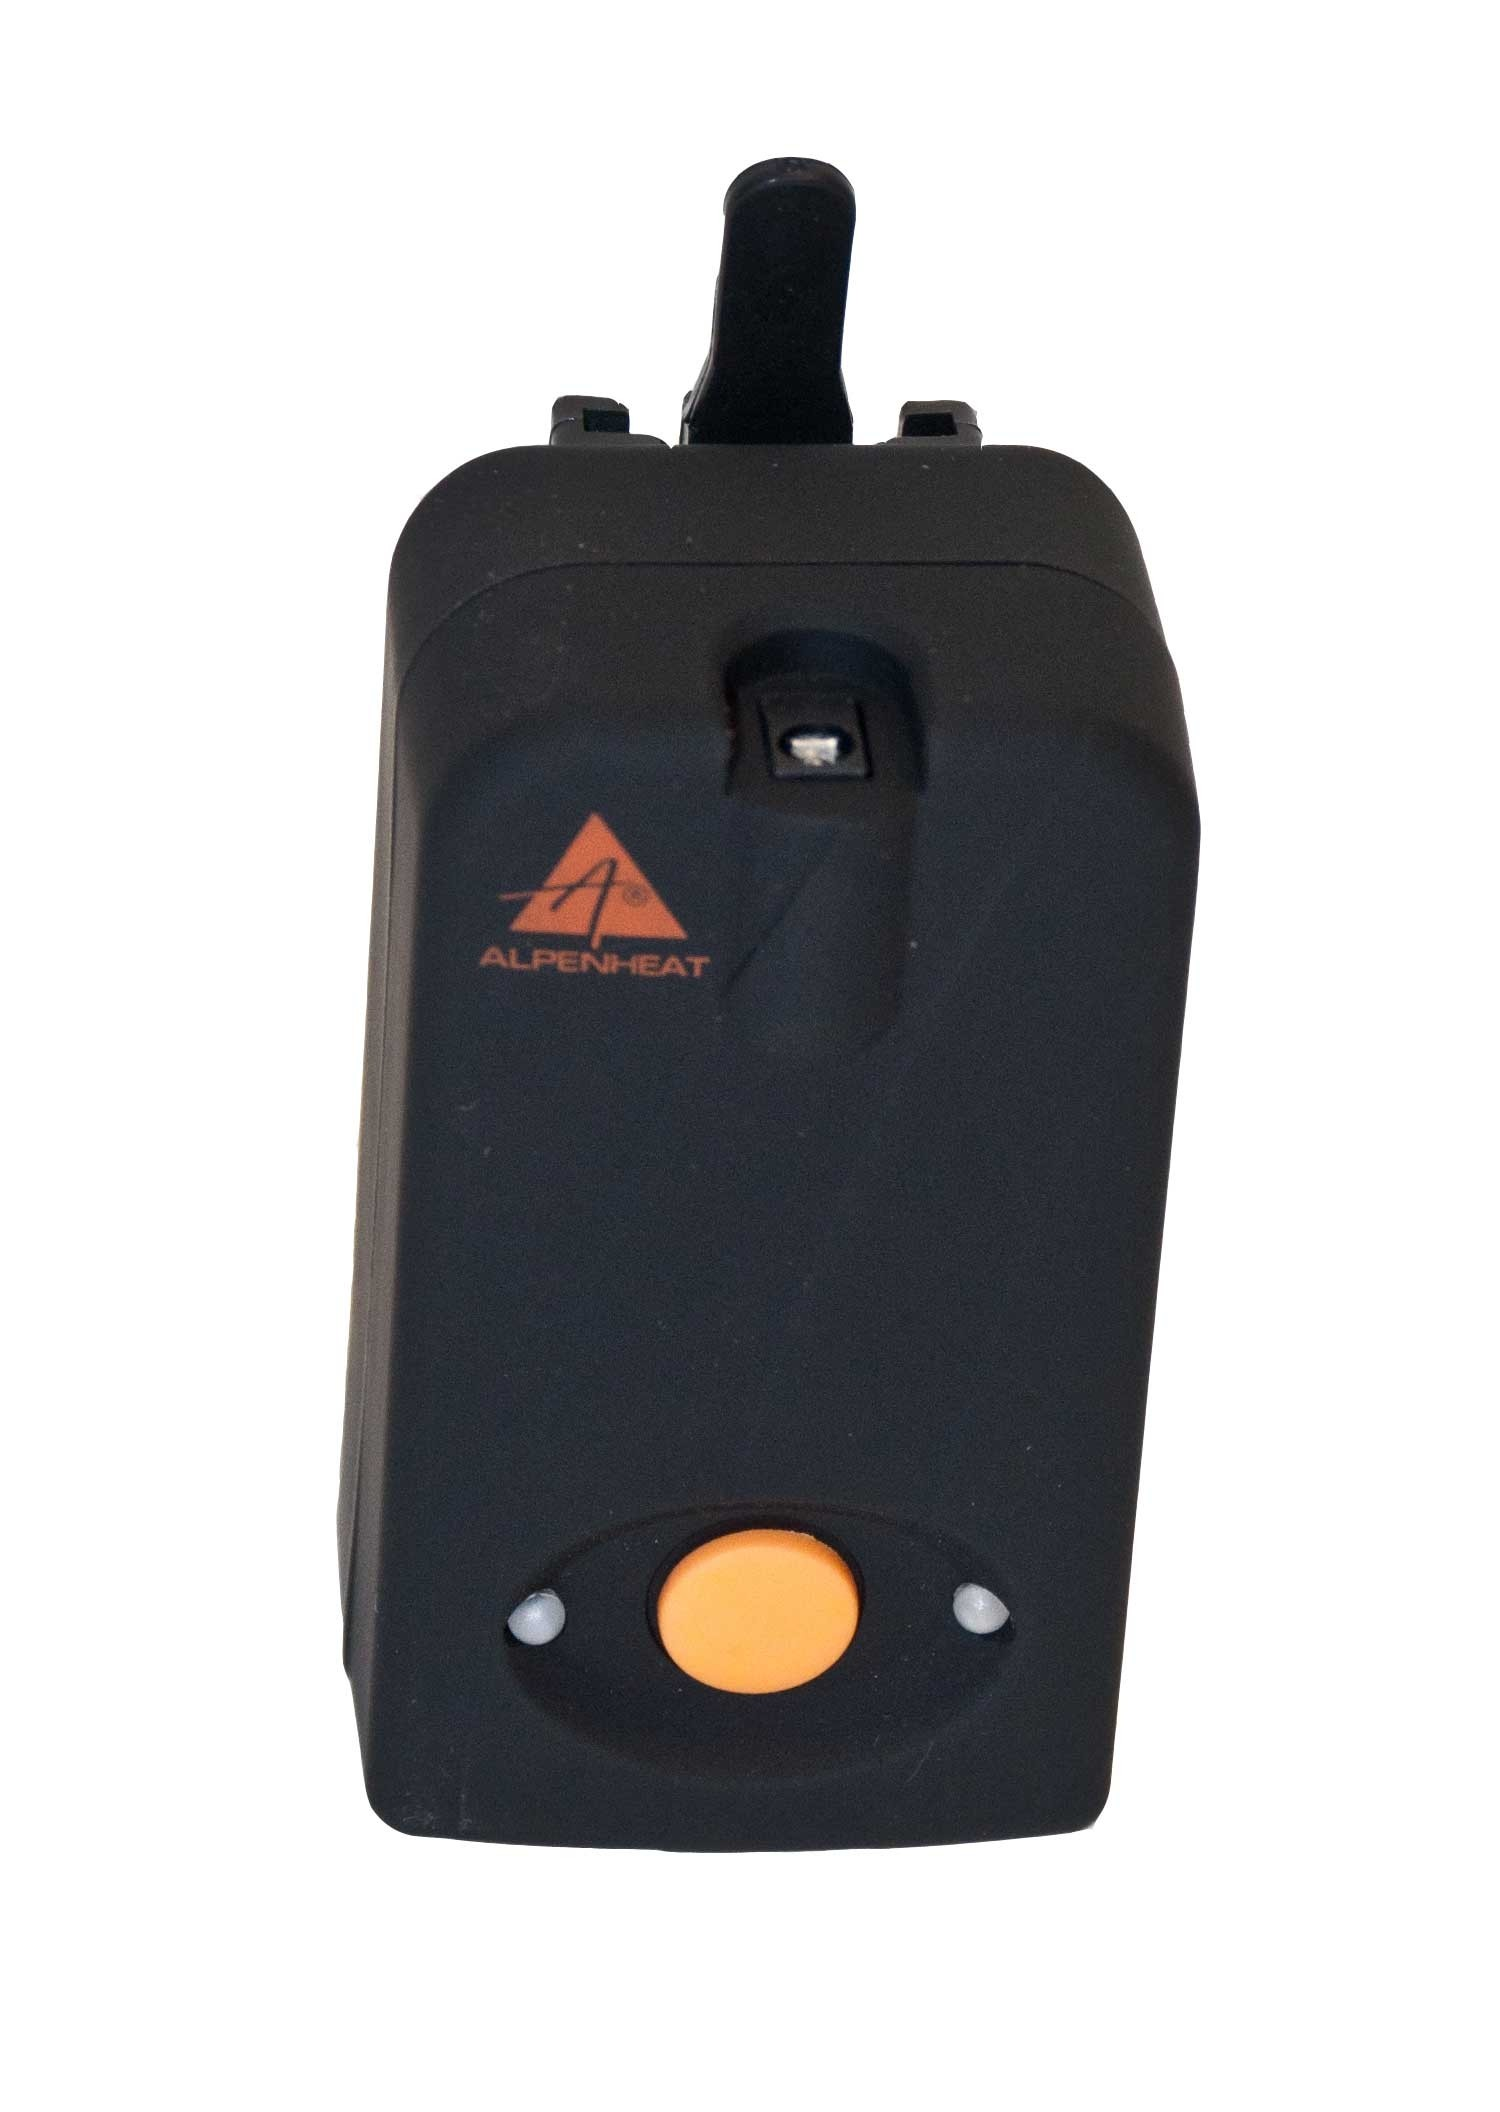 alpenheat lithium boot heaters battery